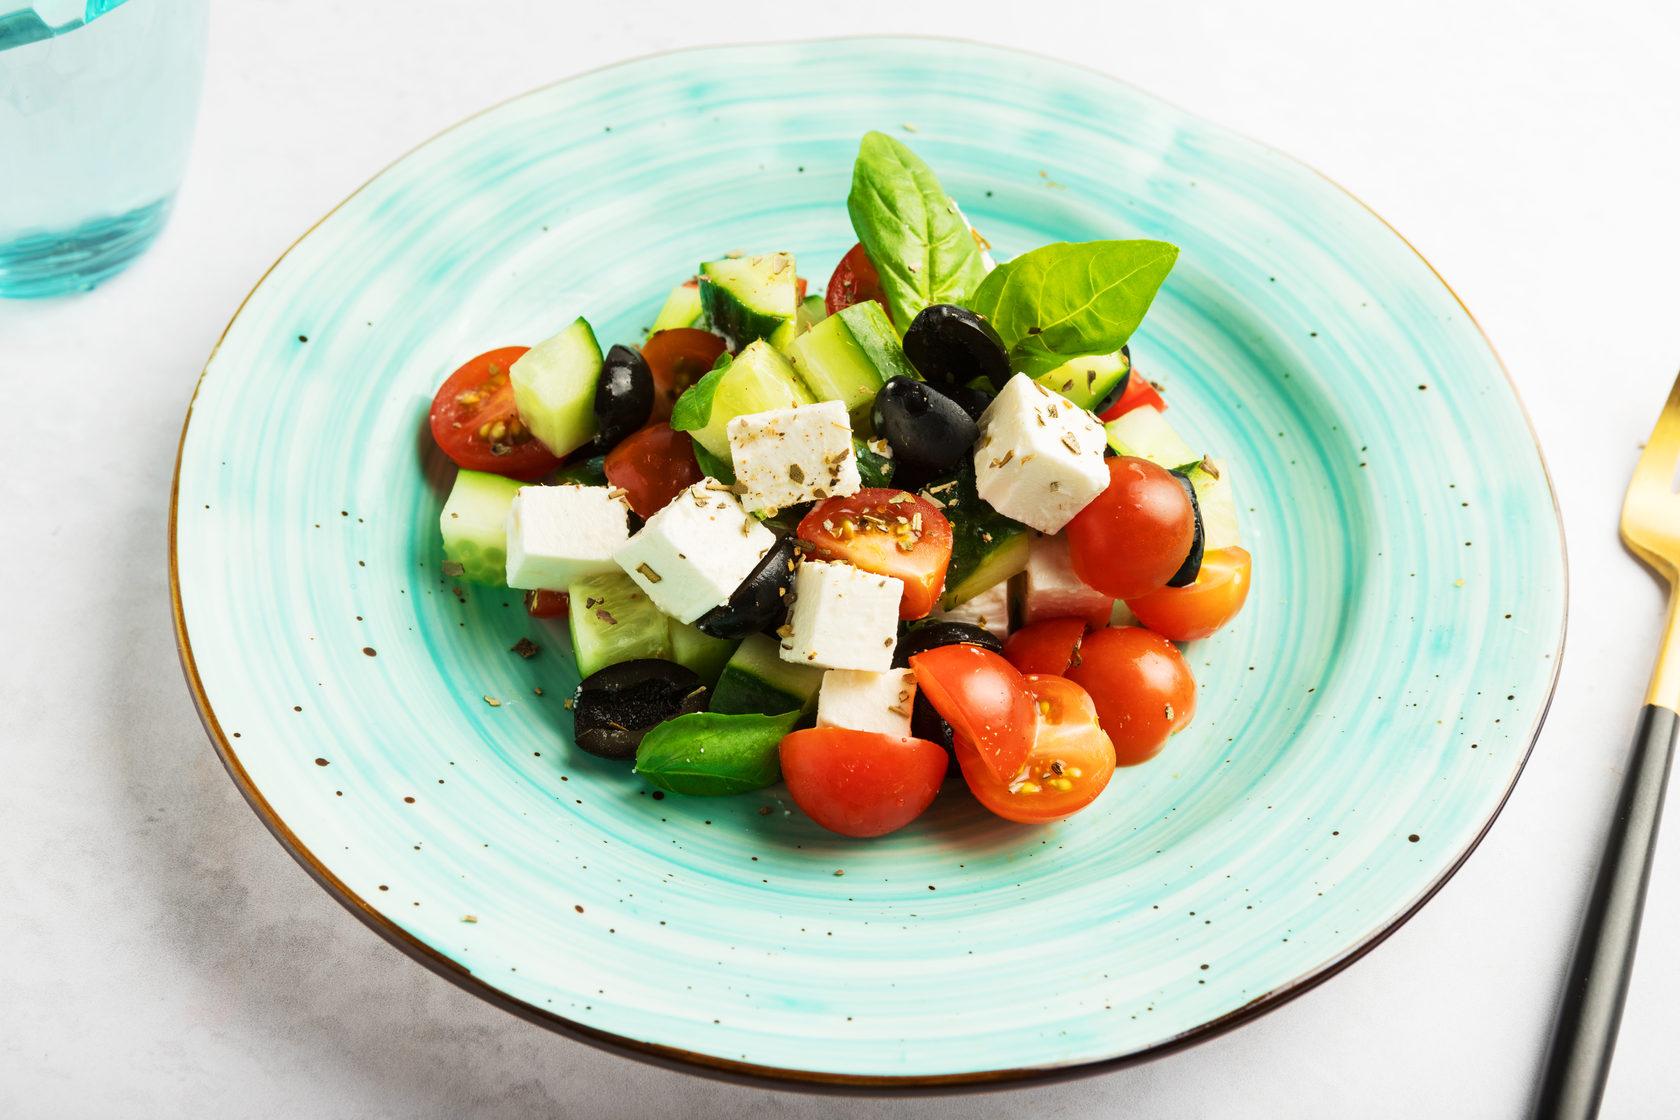 салат греческий рецепты с фото на повар ру молодости алину